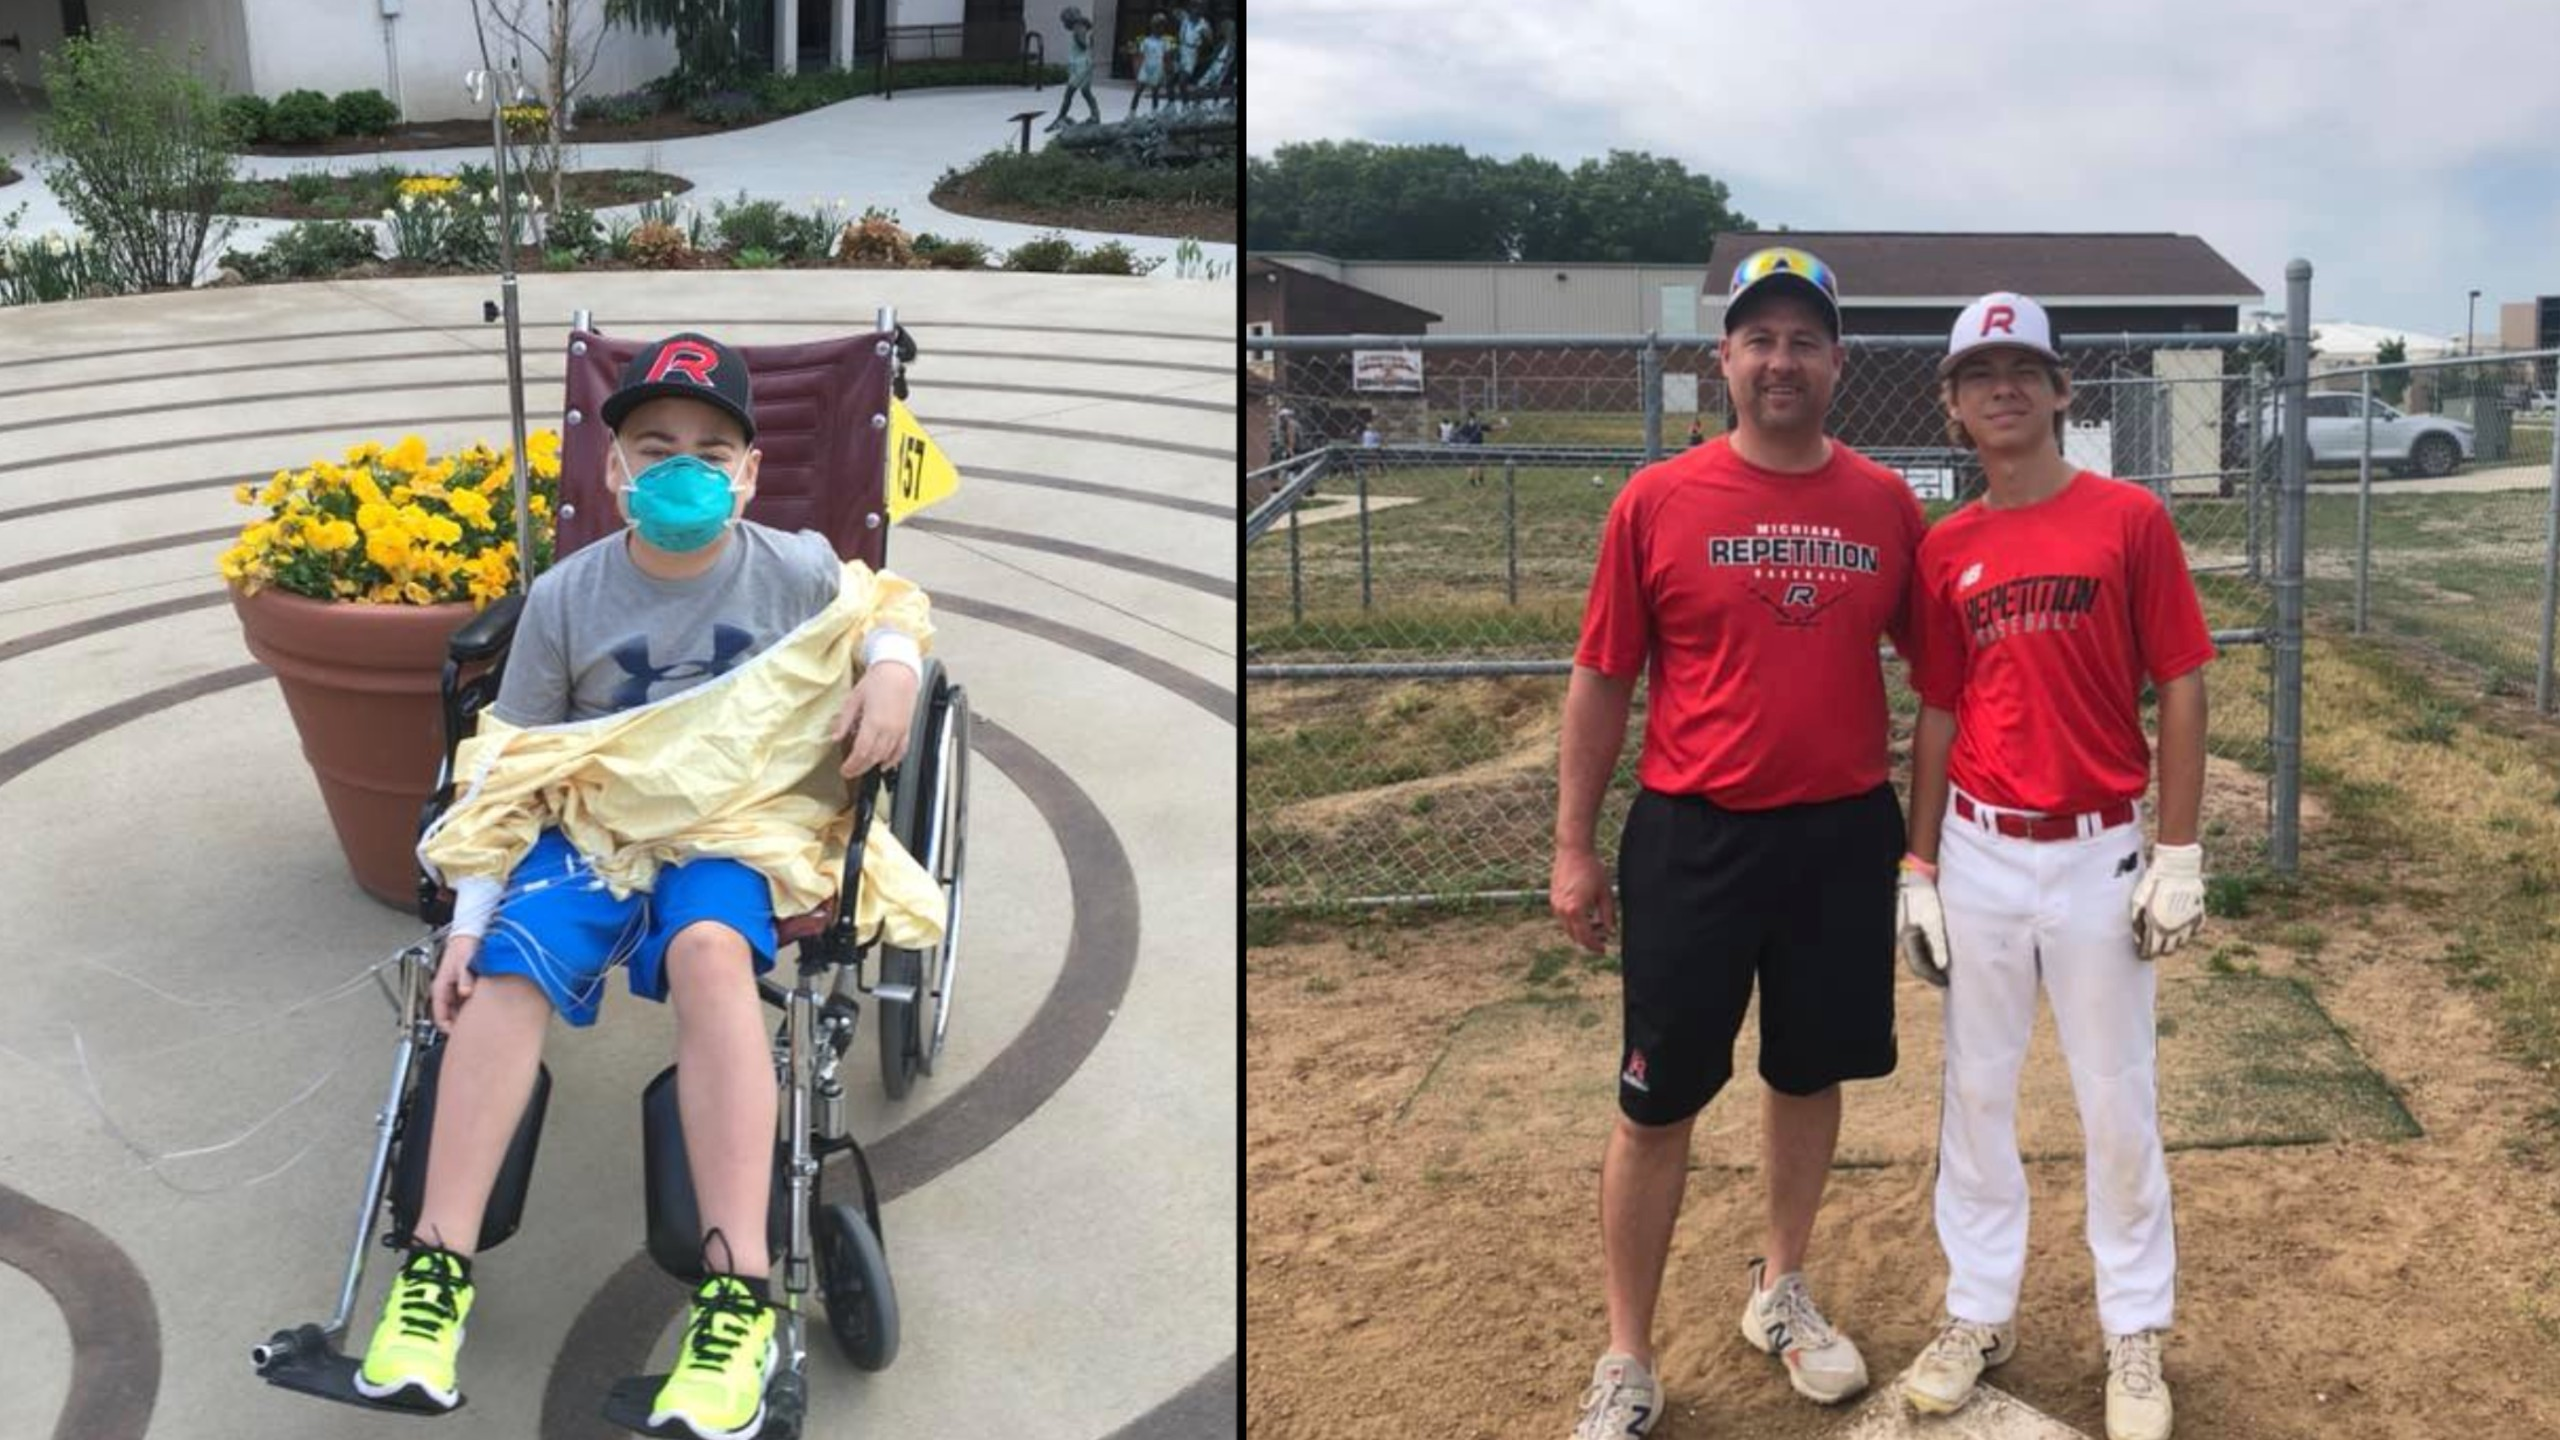 Dad donates kidney to son